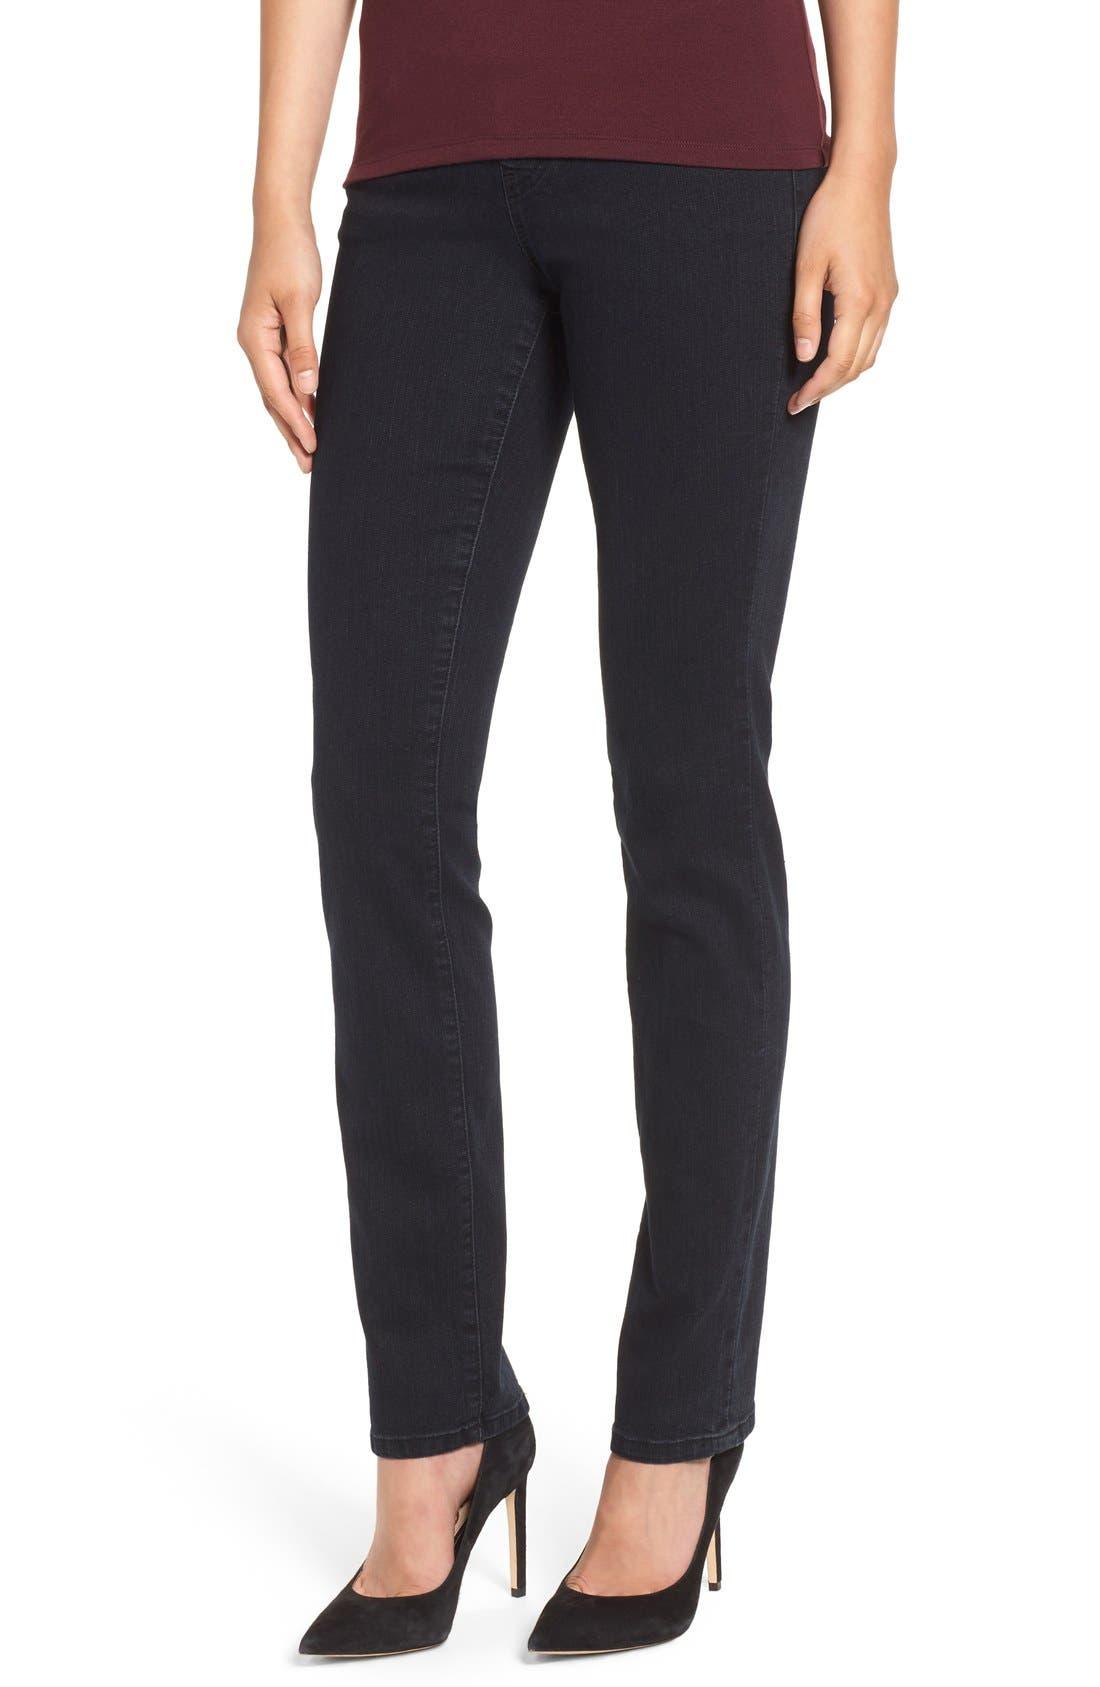 'Peri' Straight Leg Pull-On Jeans,                             Main thumbnail 1, color,                             001